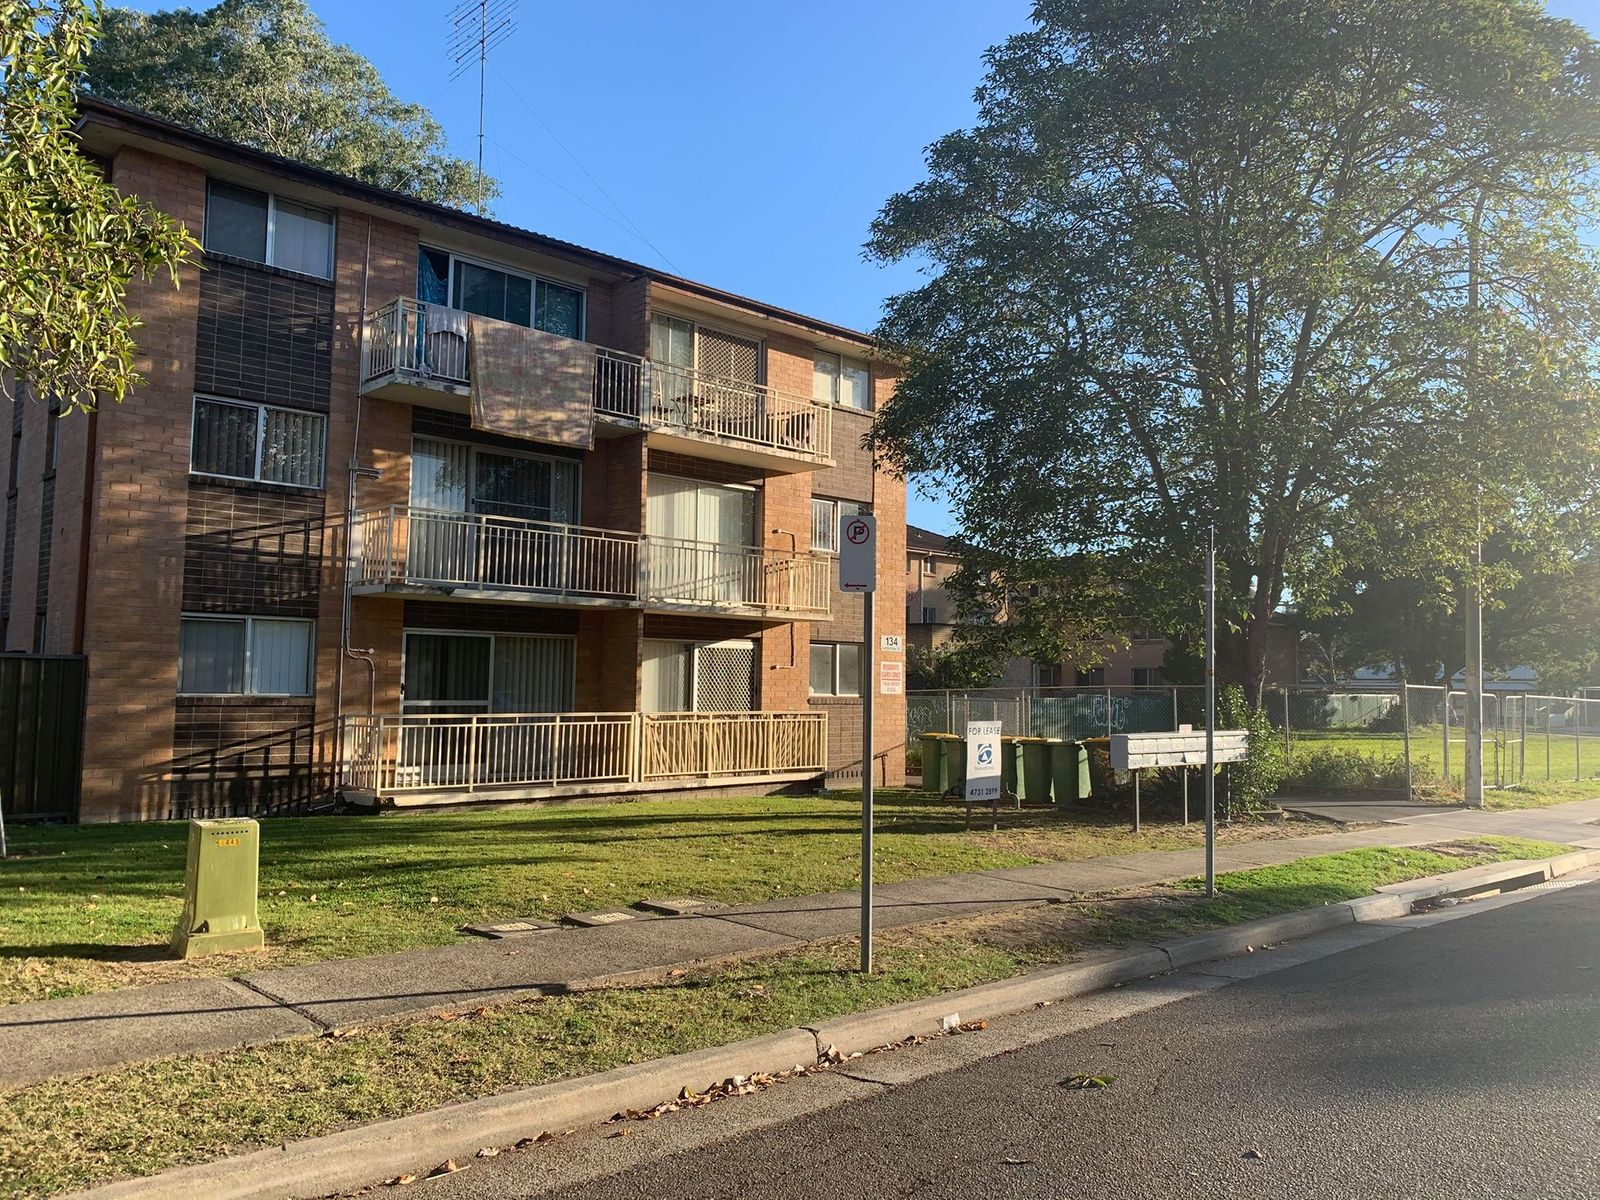 17/134 Lethbridge Street, Penrith, NSW 2751